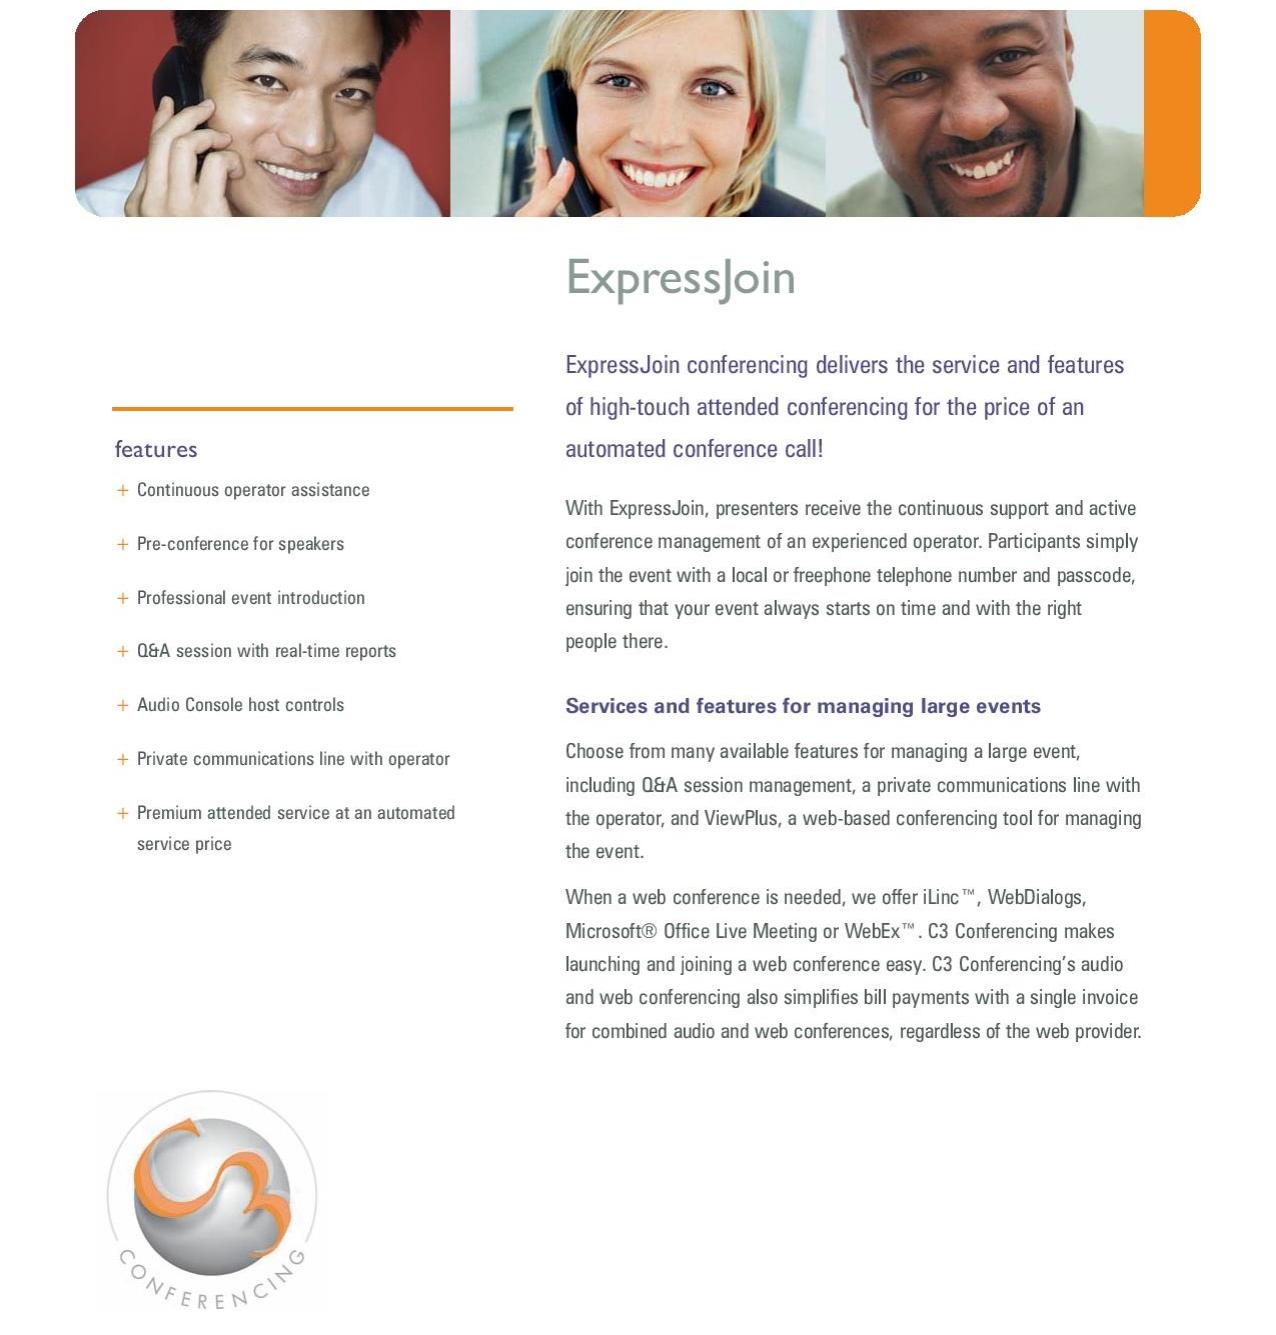 ExpressJoin-page-001.jpg